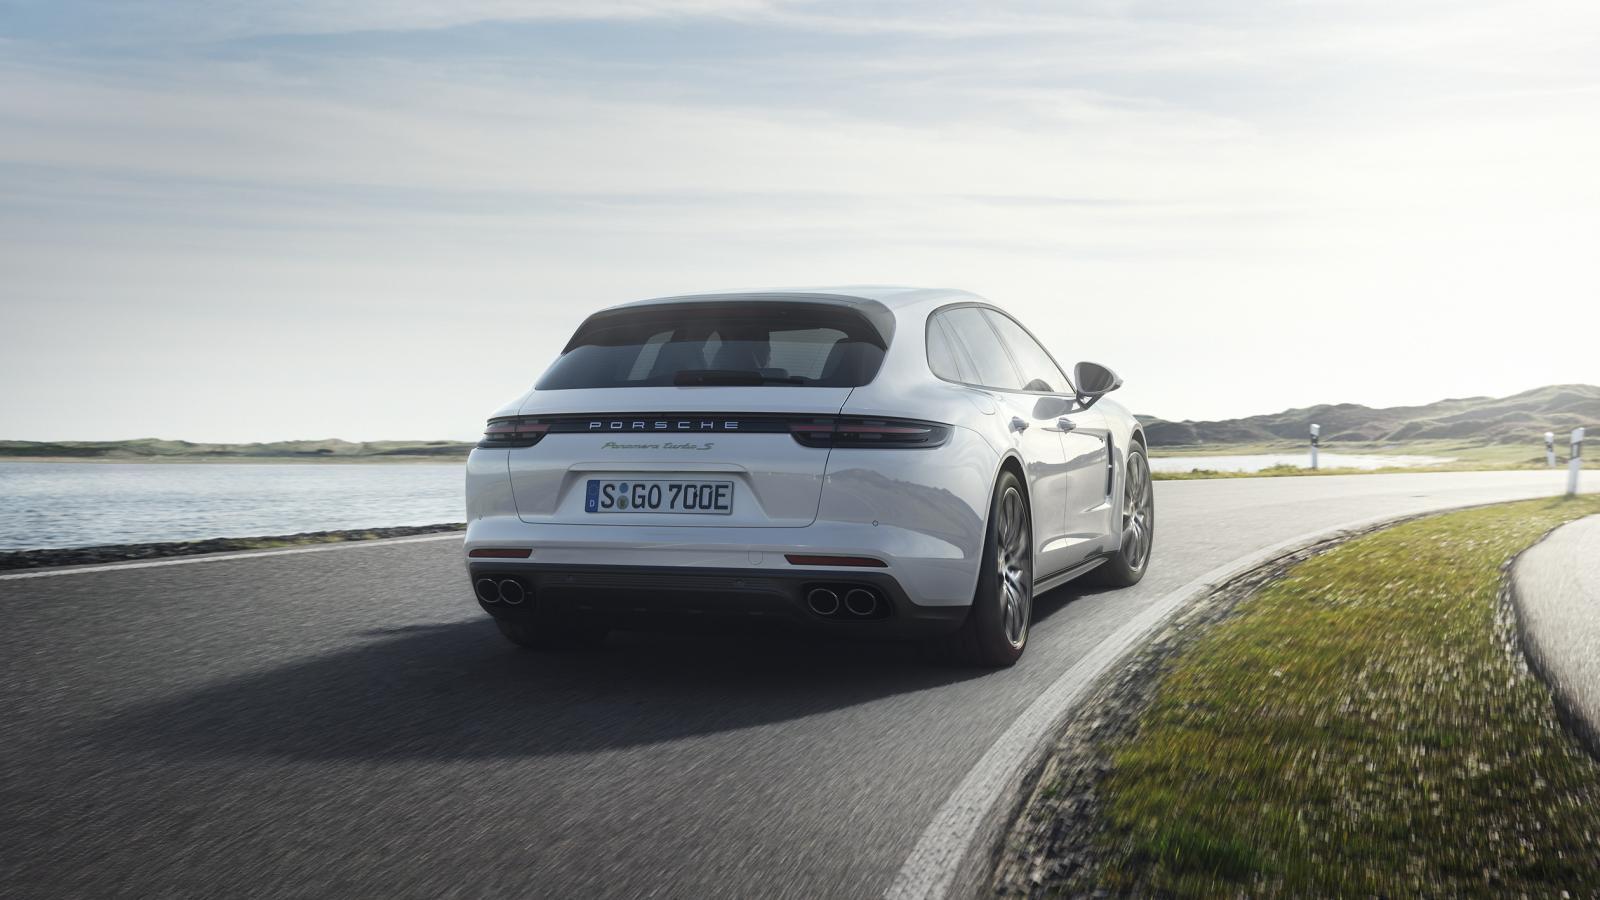 Porsche-Panamera-Turbo-S-E-Hybrid-Sport-Turismo-07